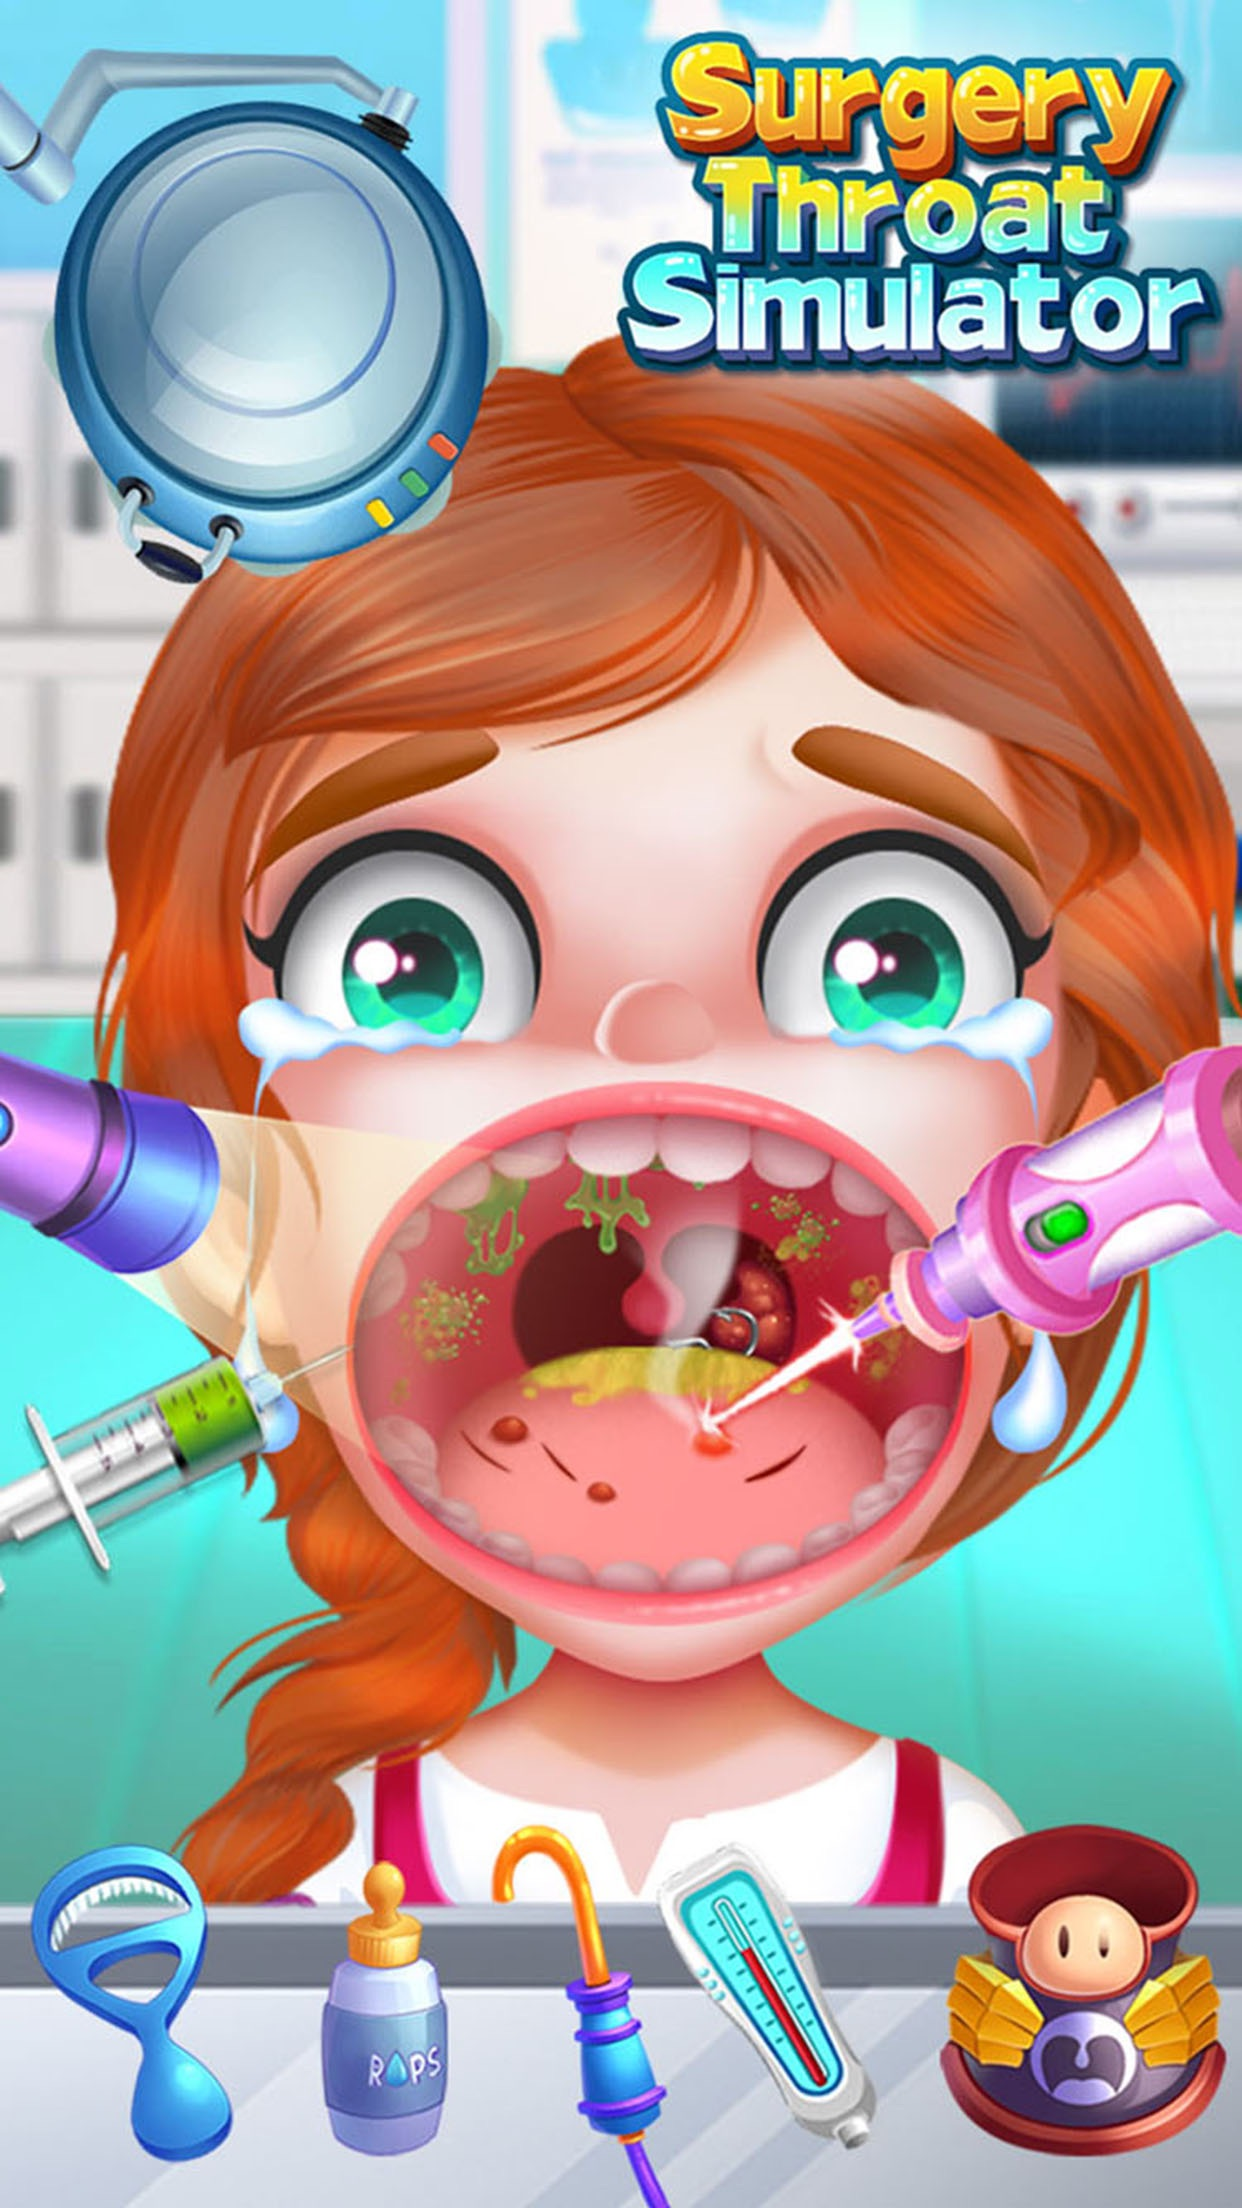 Throat Surgery Simulator - Free Doctor Game Screenshot